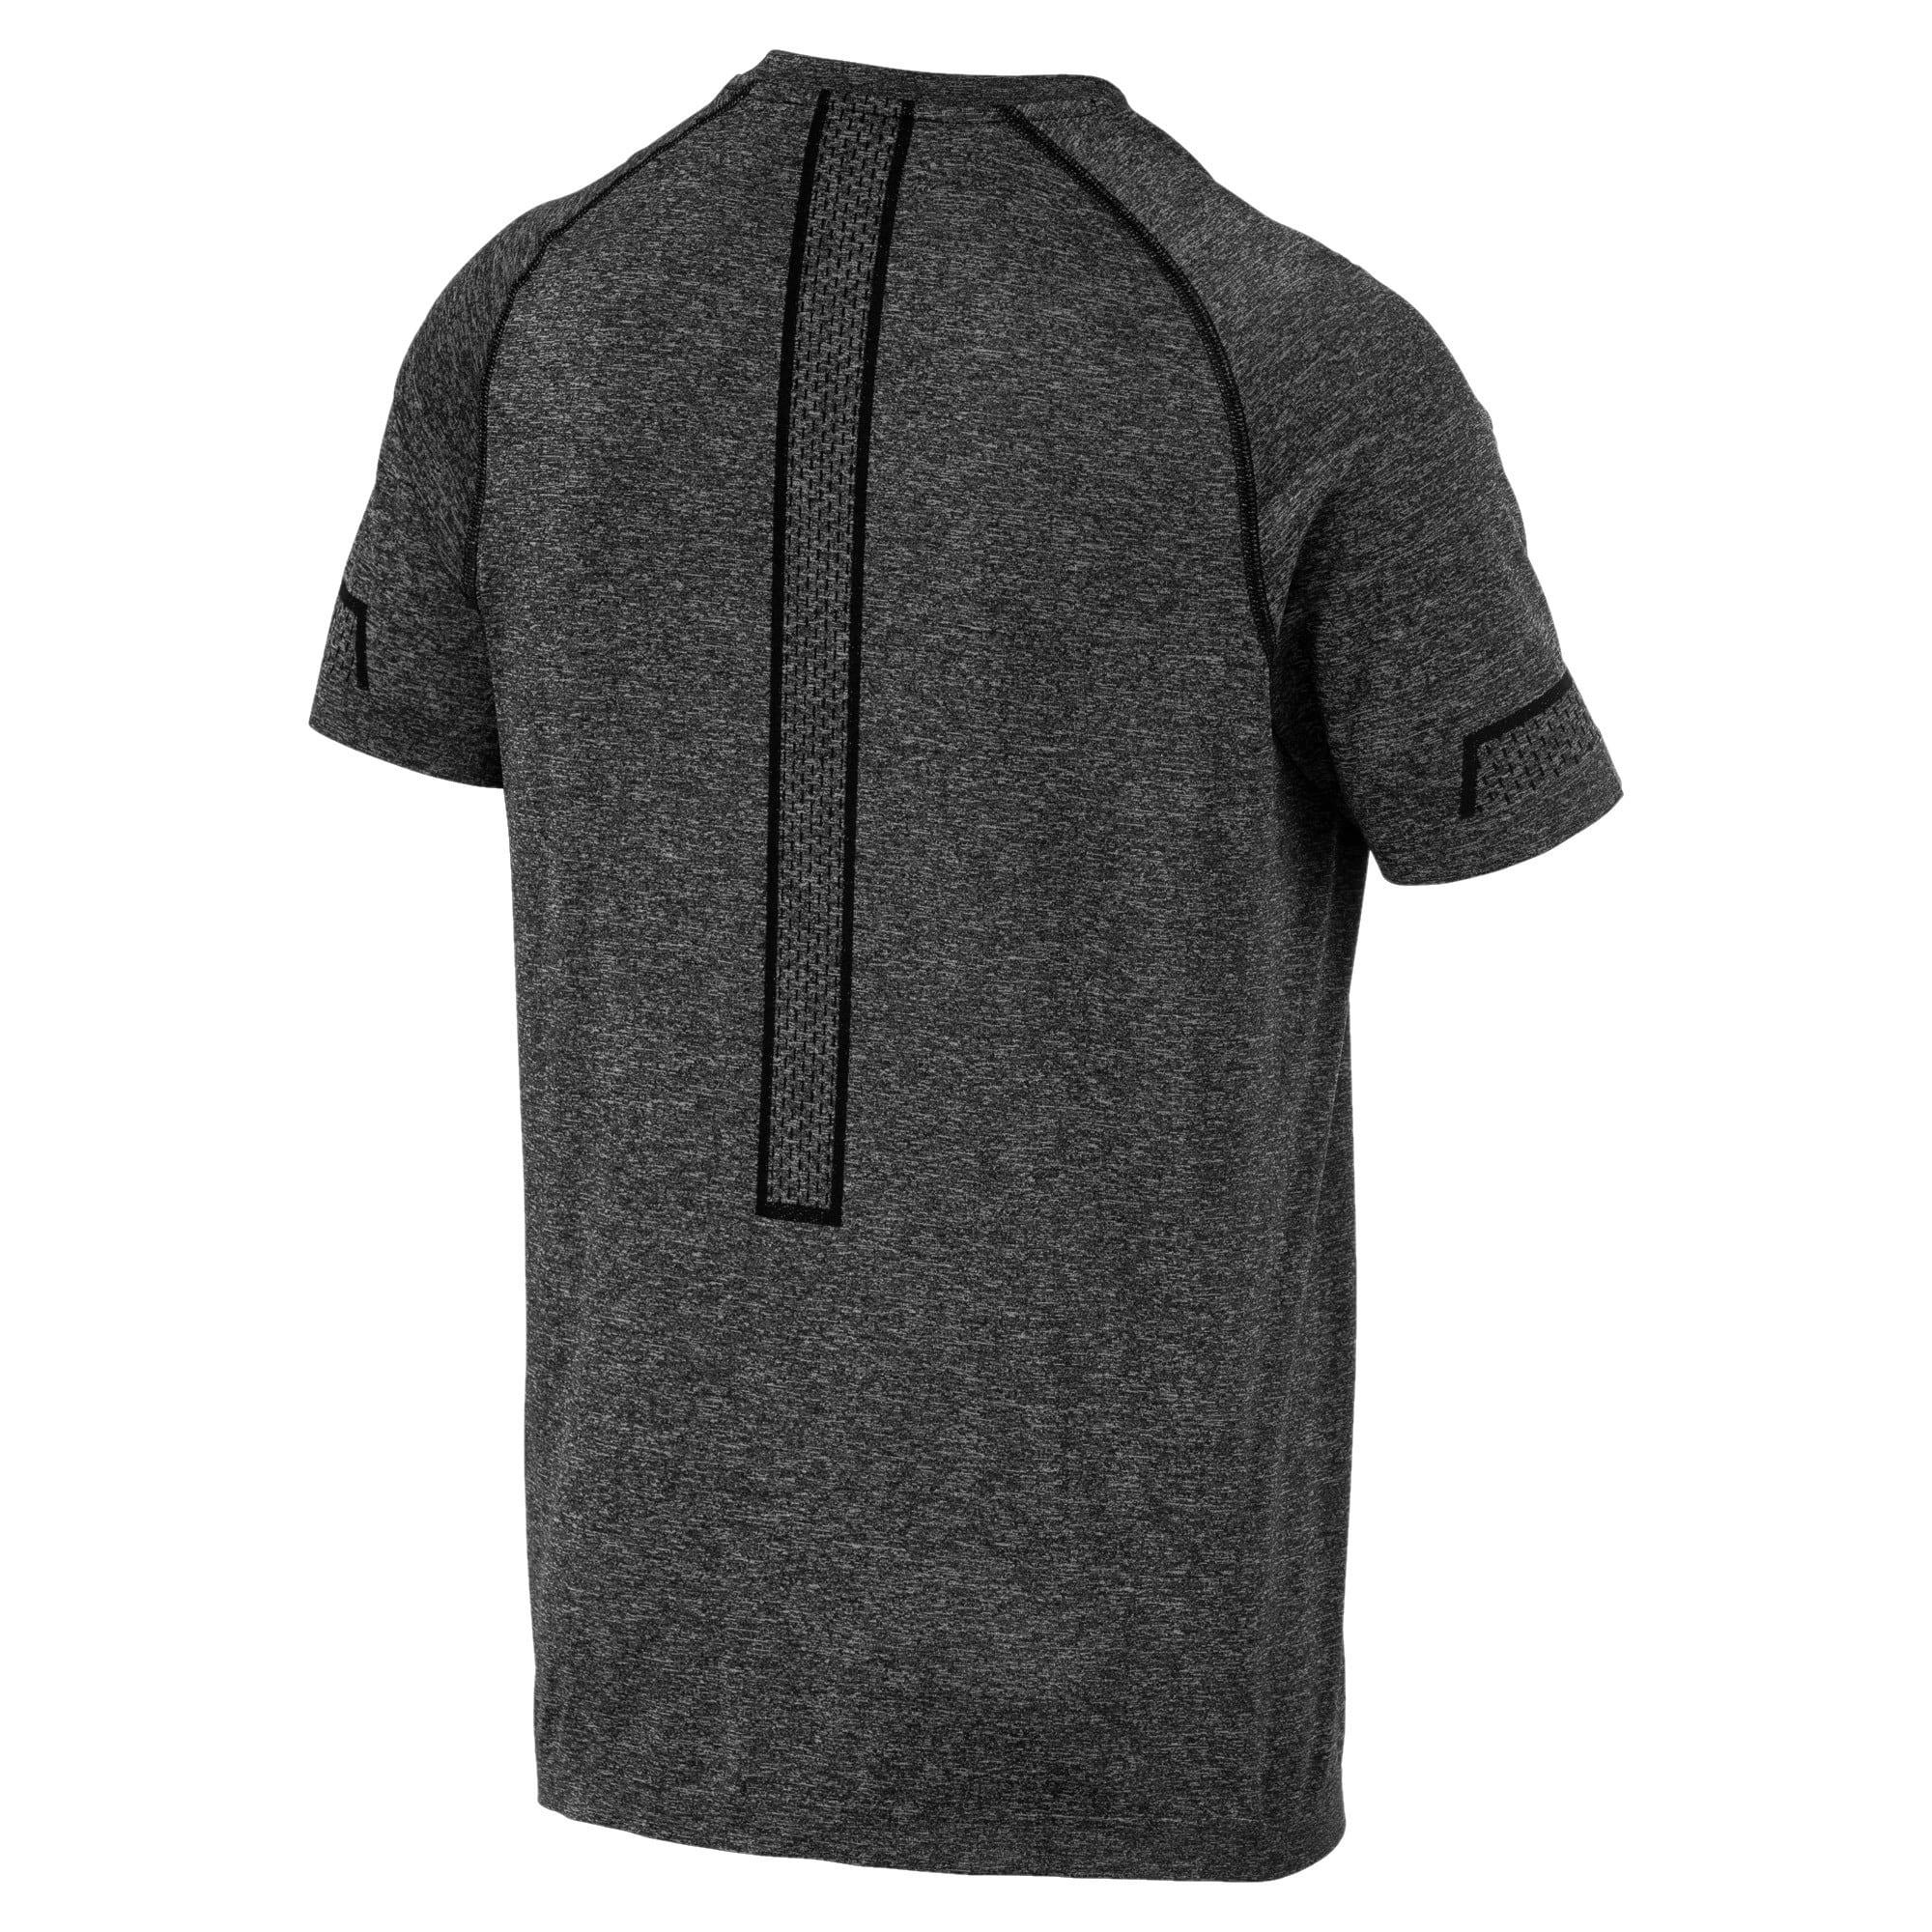 Thumbnail 5 of Energy Seamless Herren Training T-Shirt, Puma Black Heather, medium